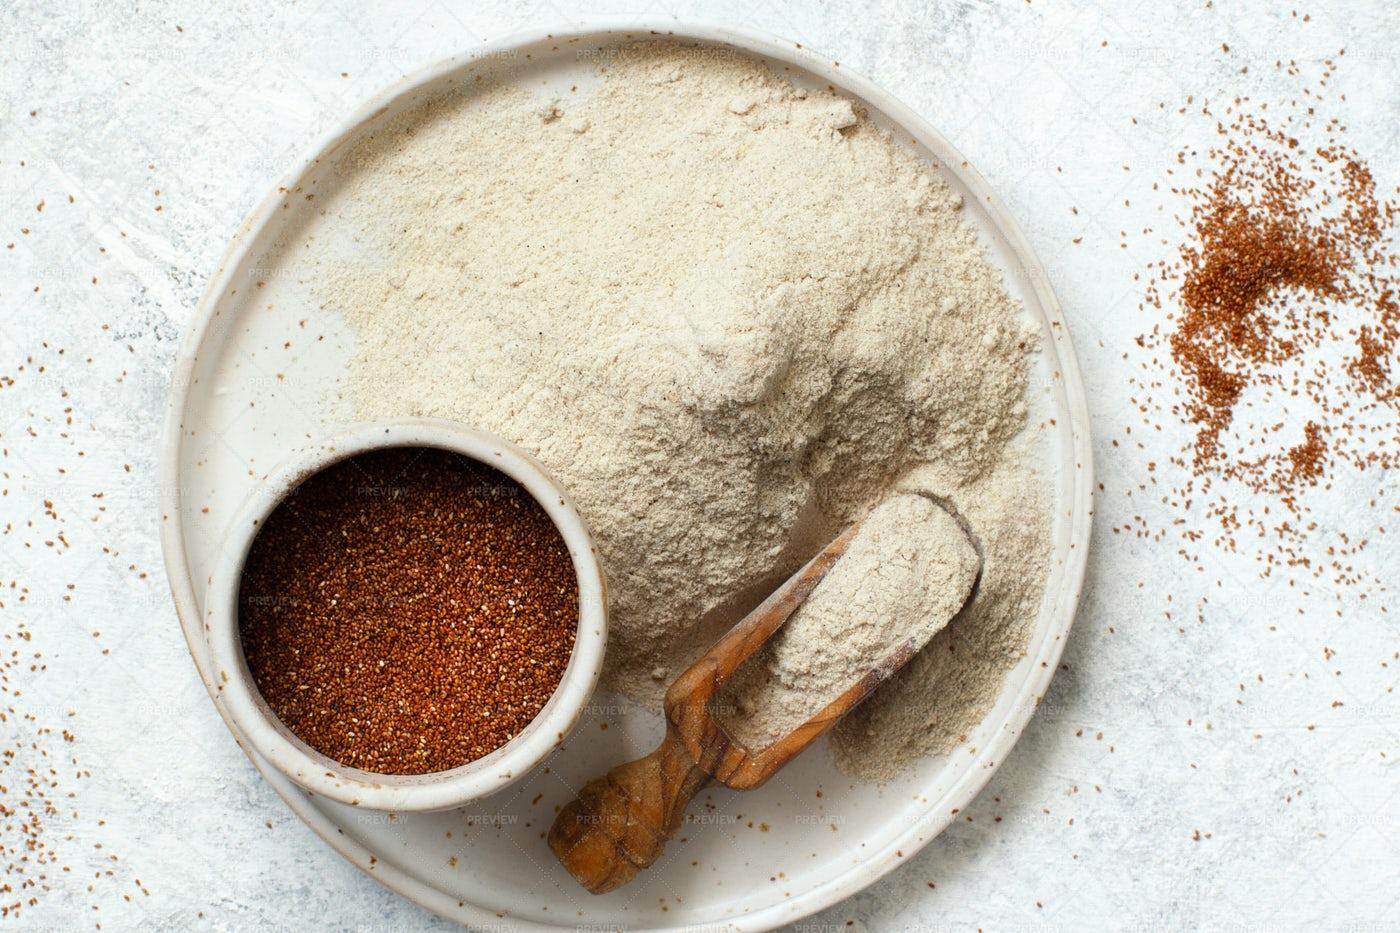 Flour And Grains: Stock Photos